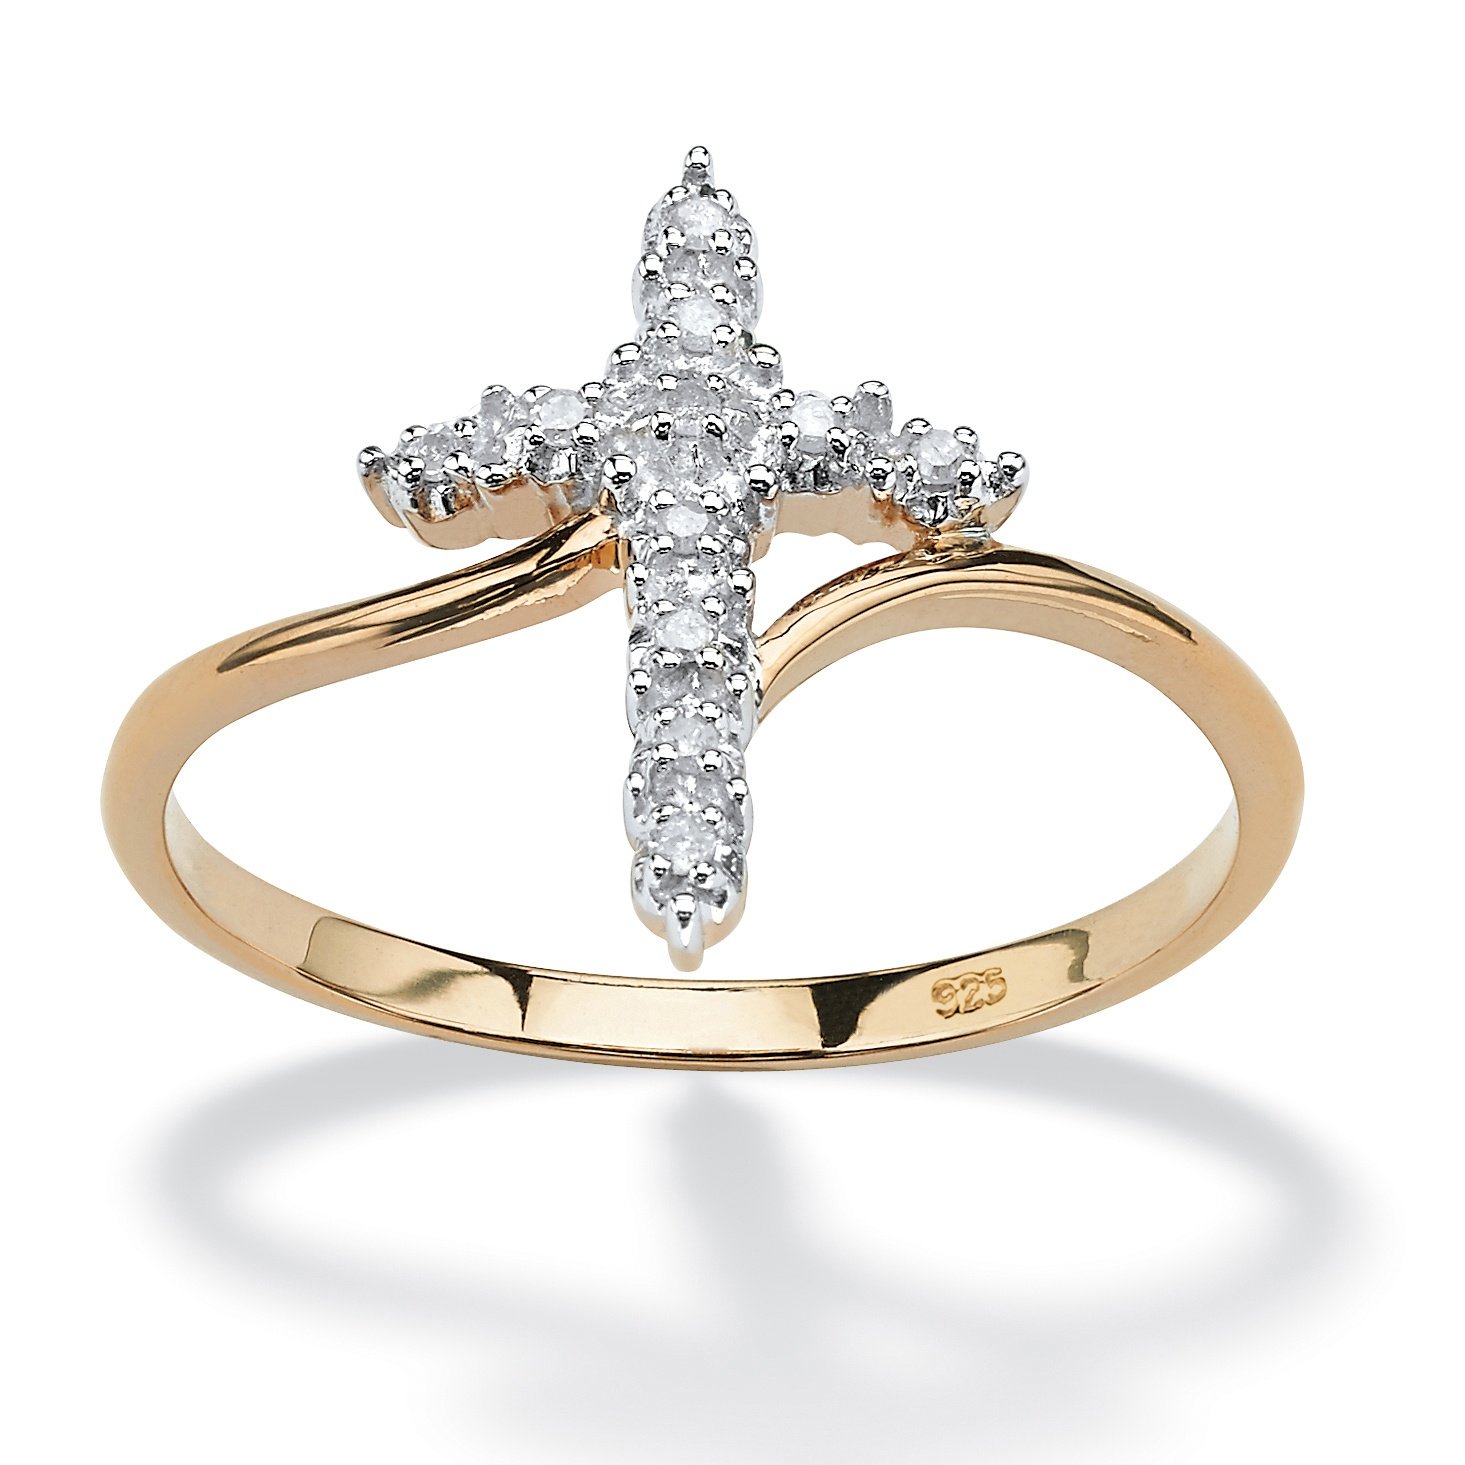 Palmbeach Jewelry Diamond 18K Yellow Gold Over 925